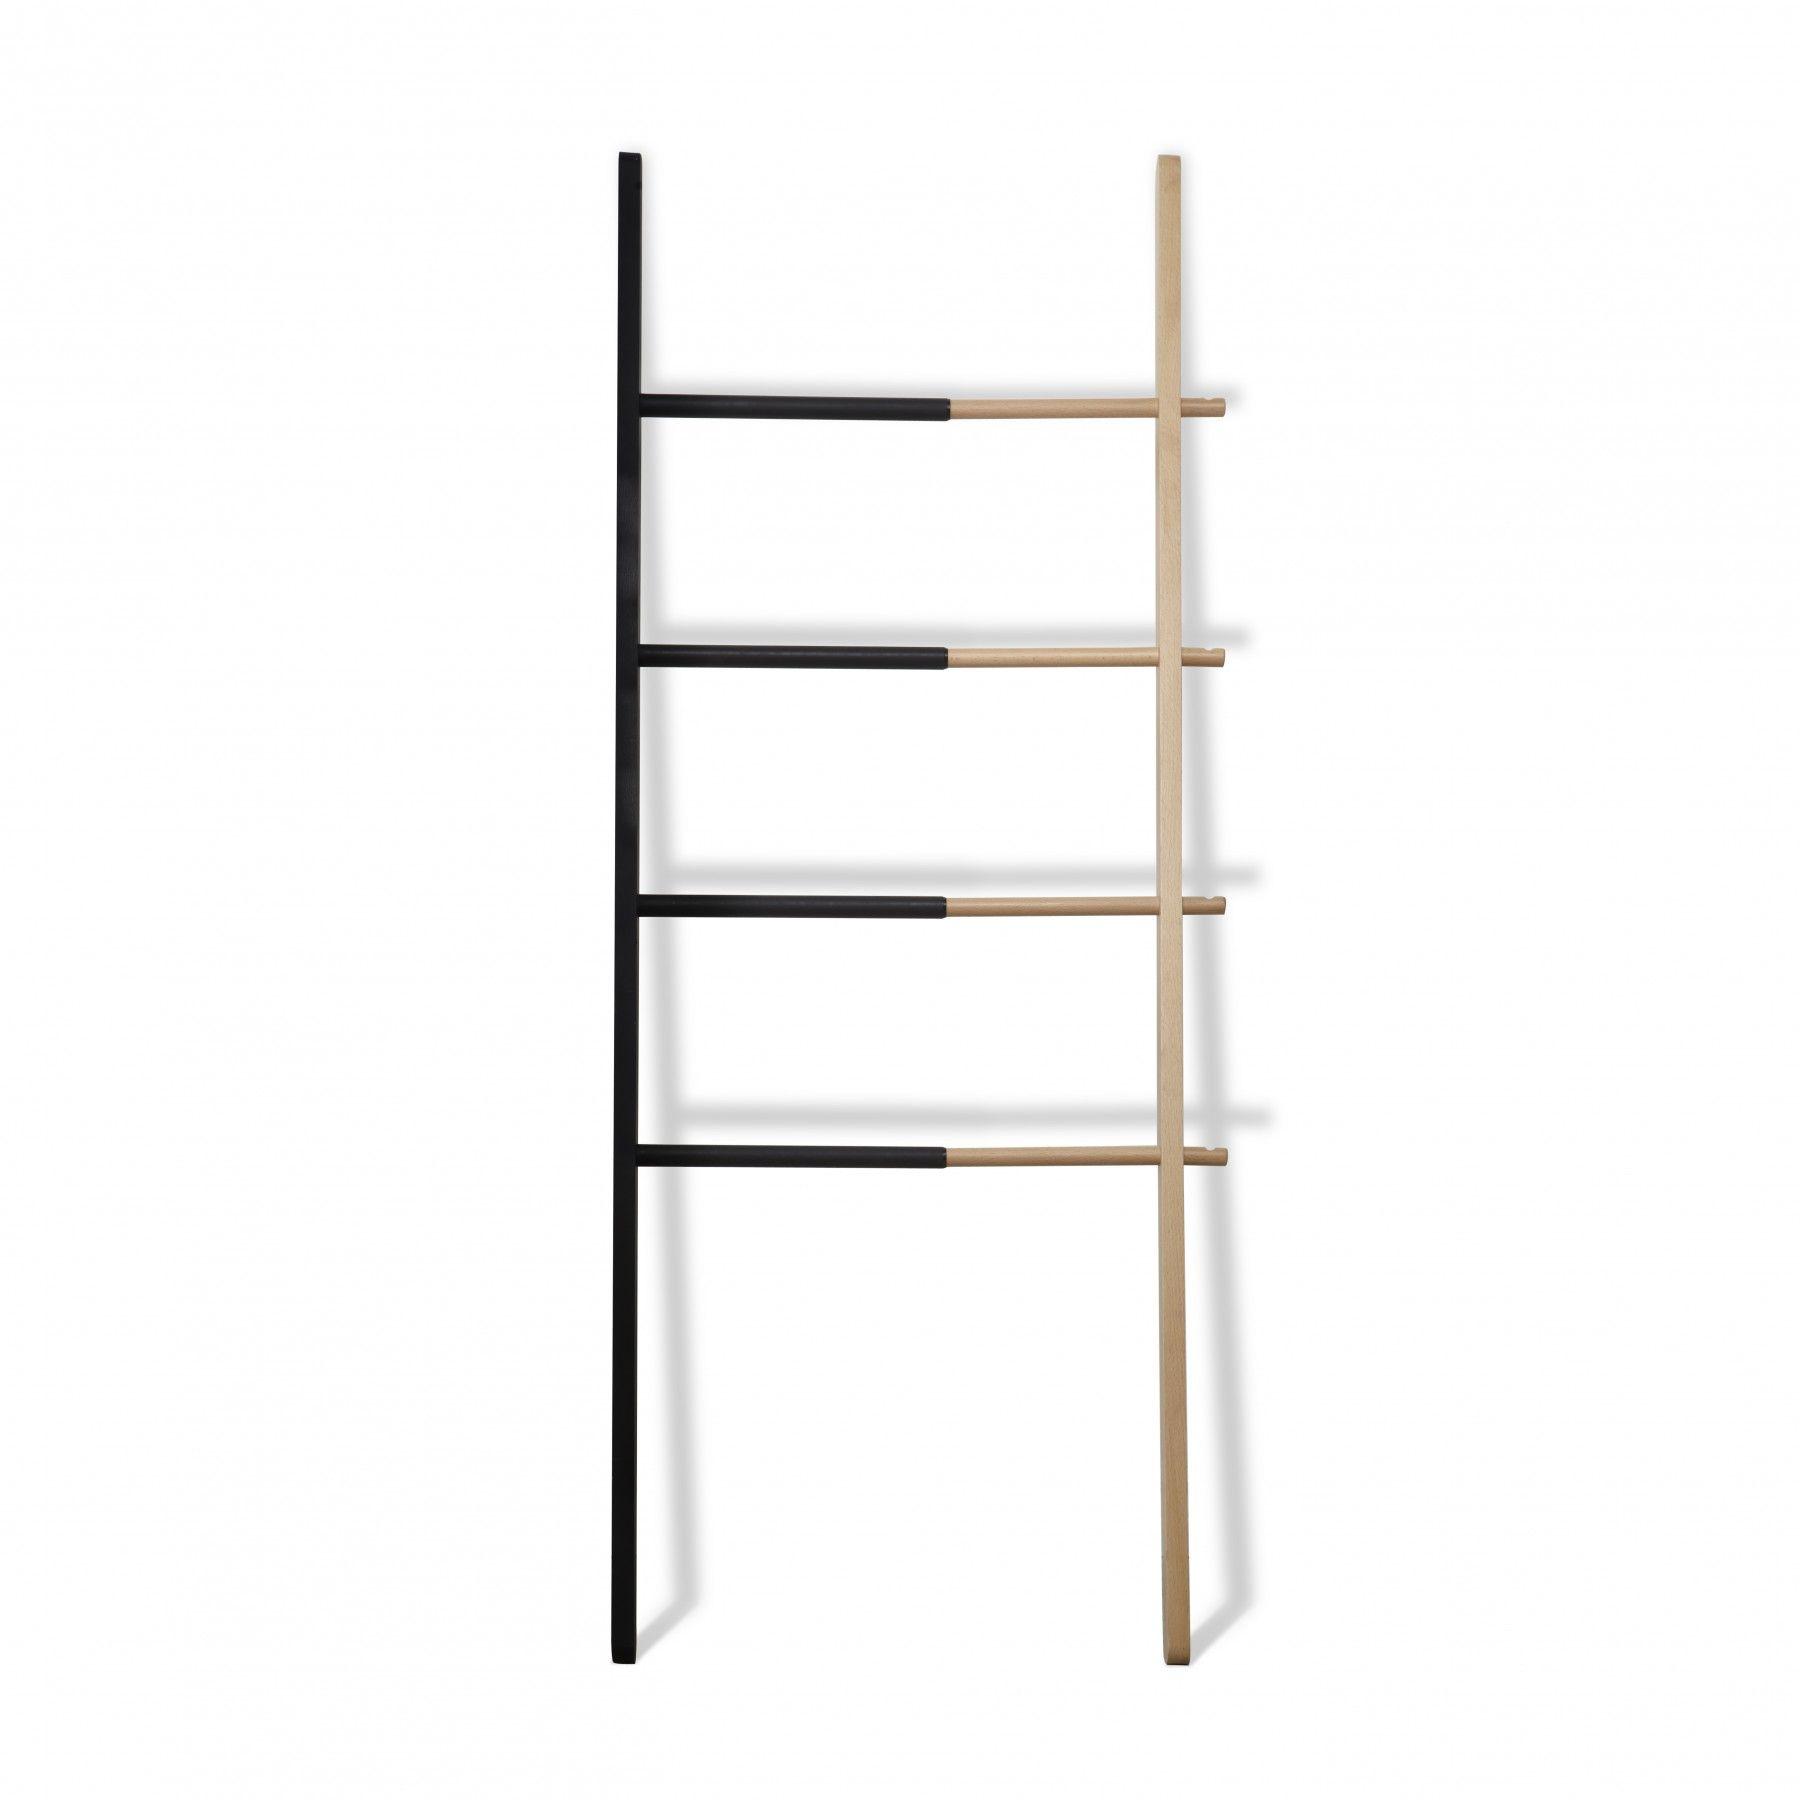 Ladder | $80